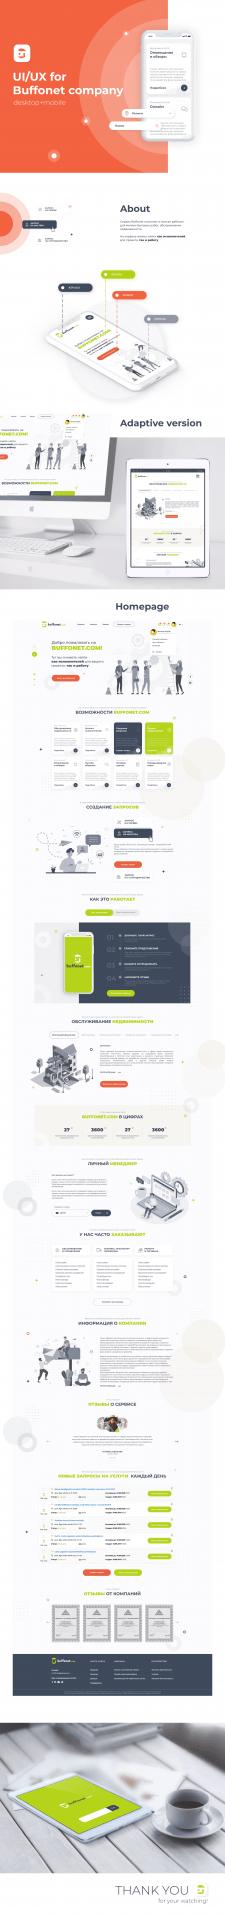 UI/UX дизайн для сервиса Buffonet